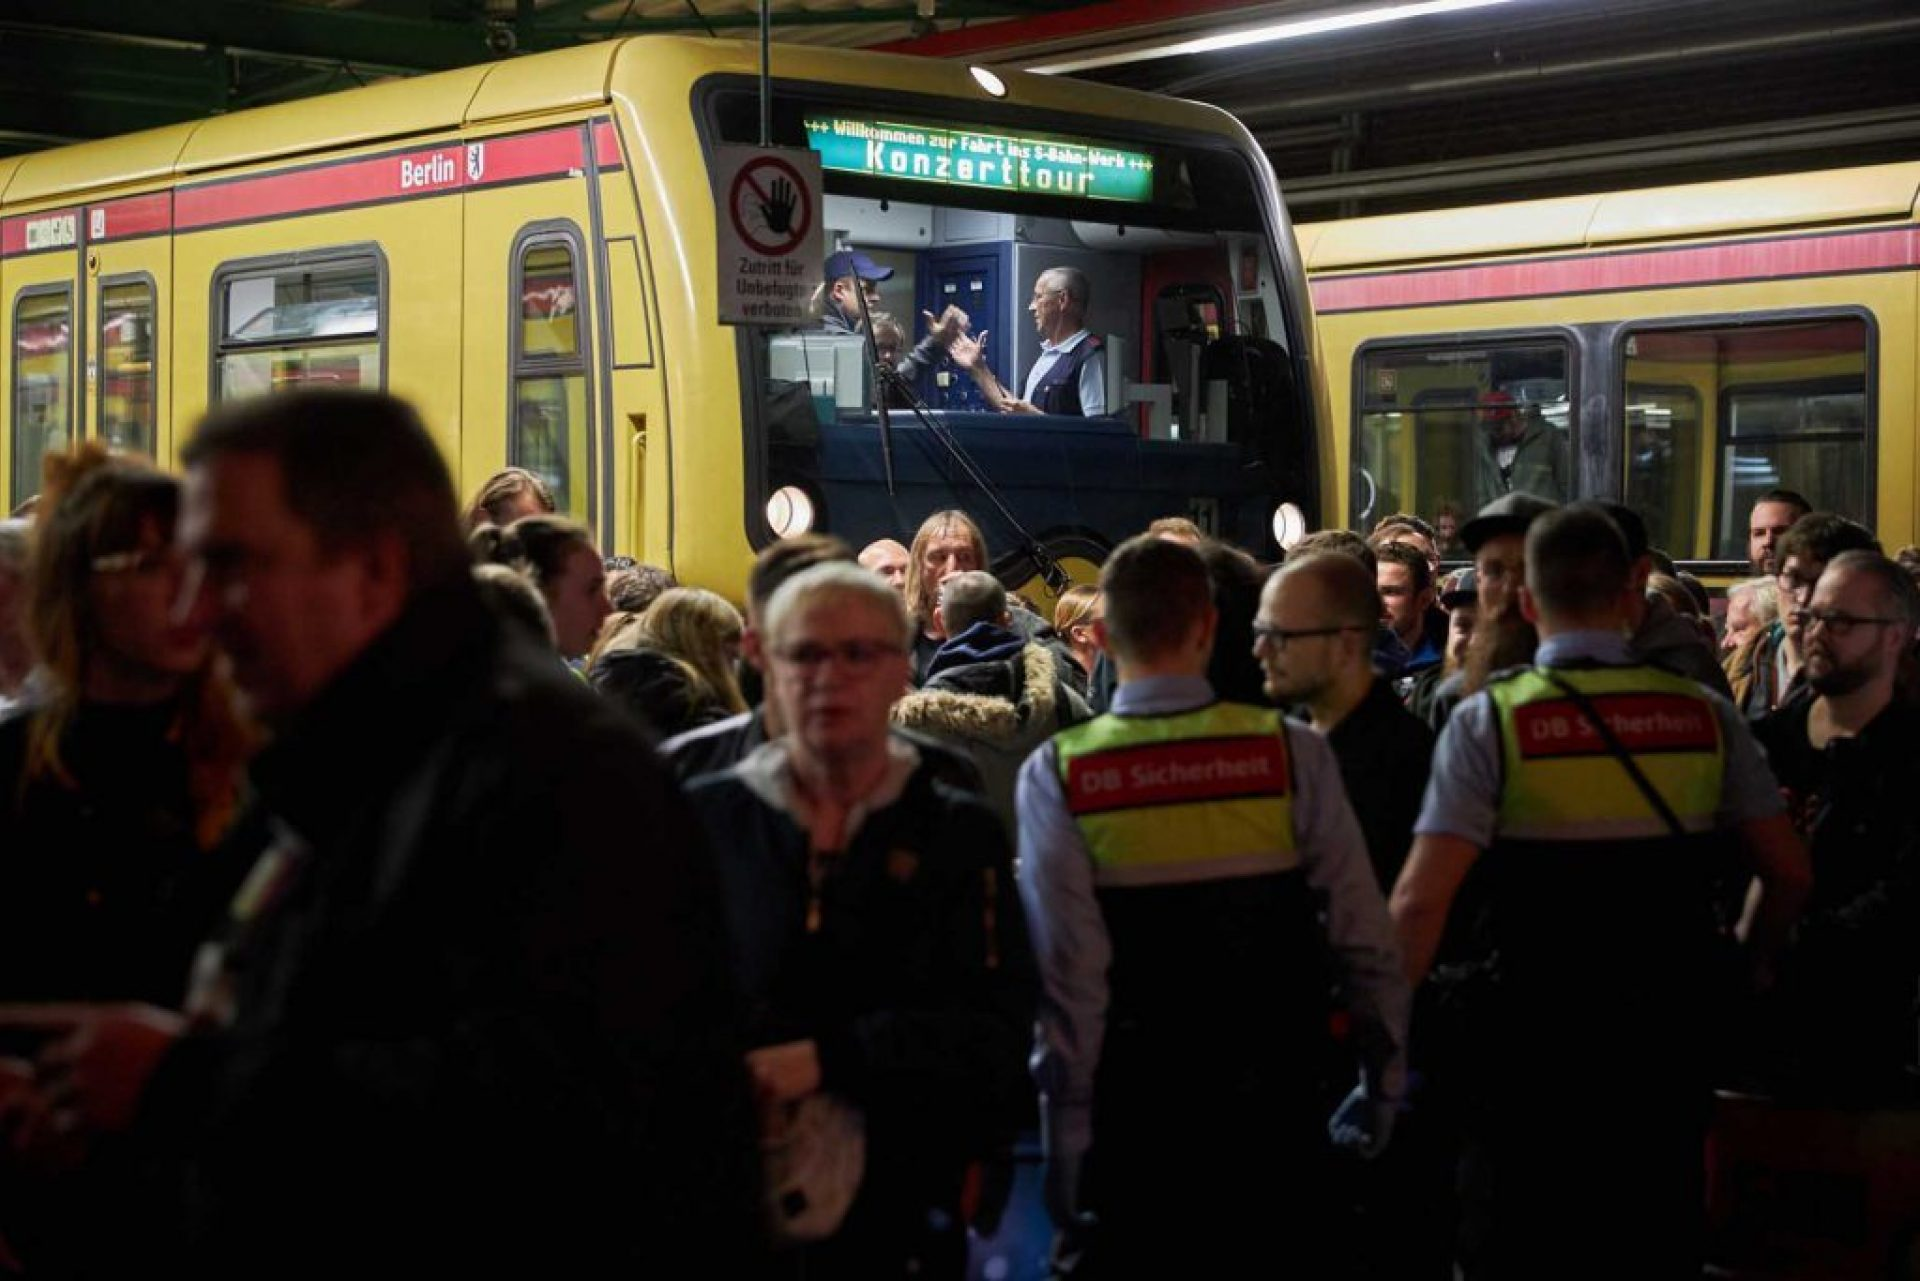 Romano S Bahn Berlin fischer Appelt Konzert Bahnhof